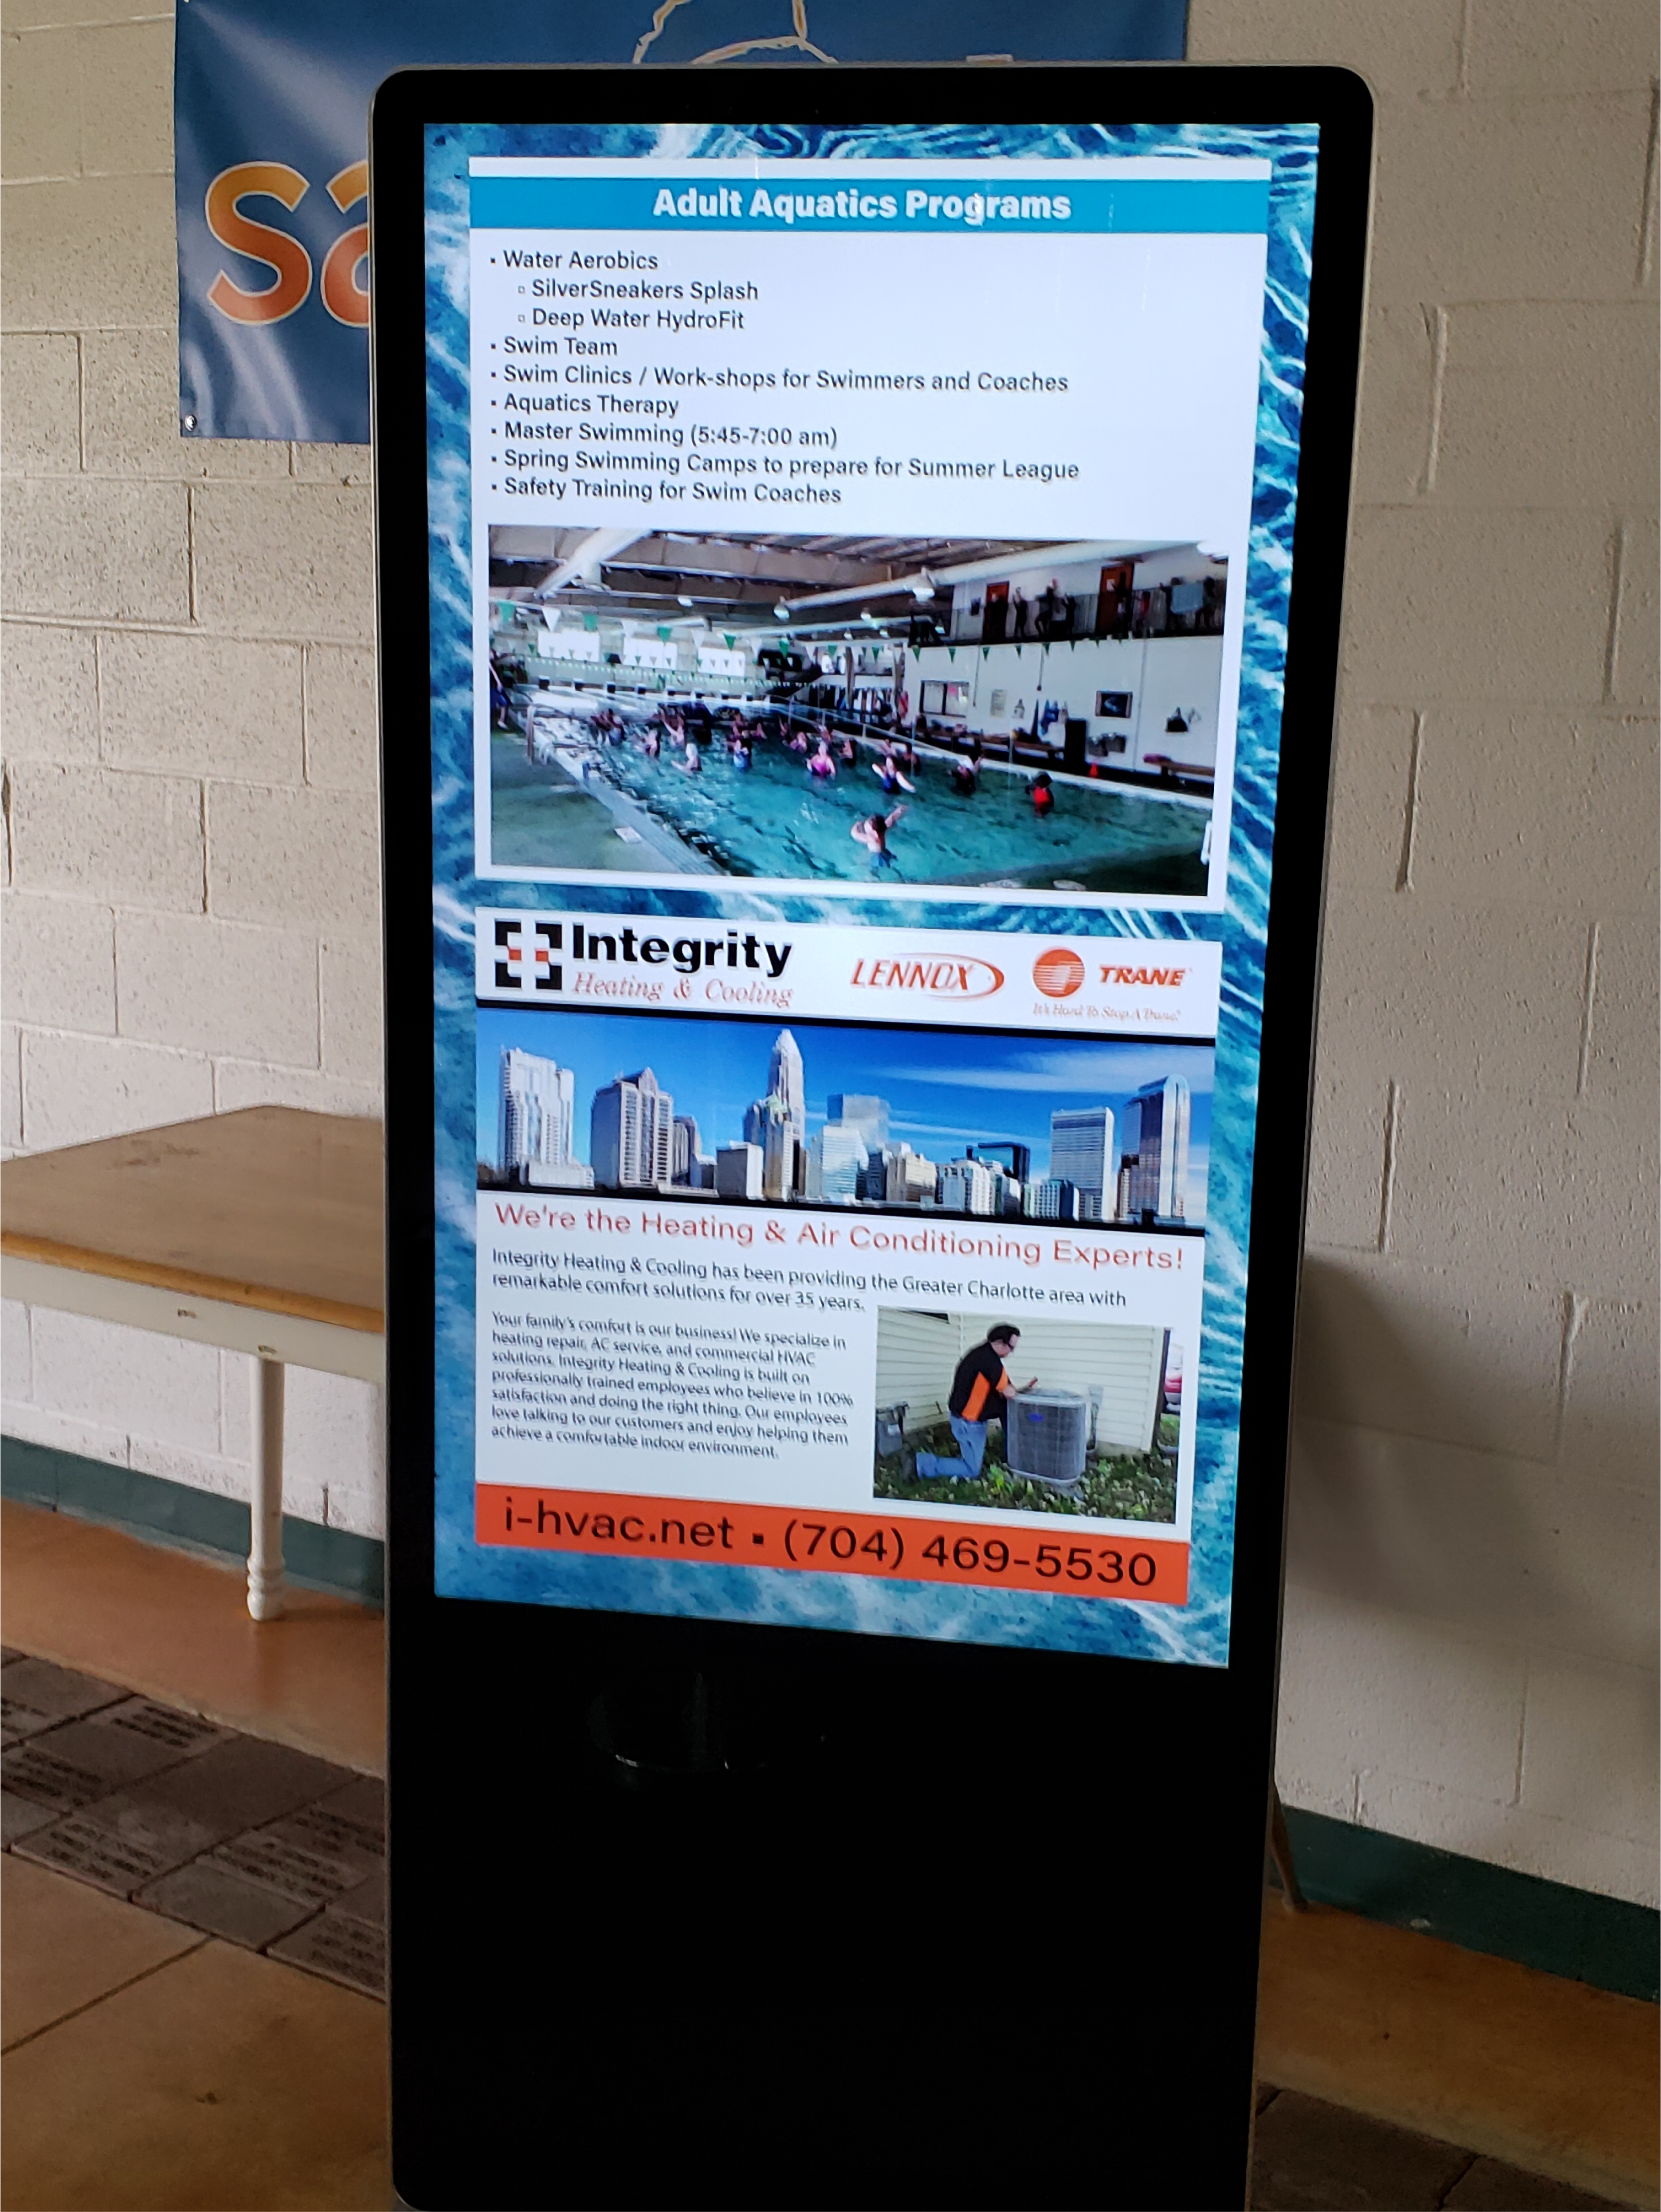 NOMAD Aquatics & Fitness Center